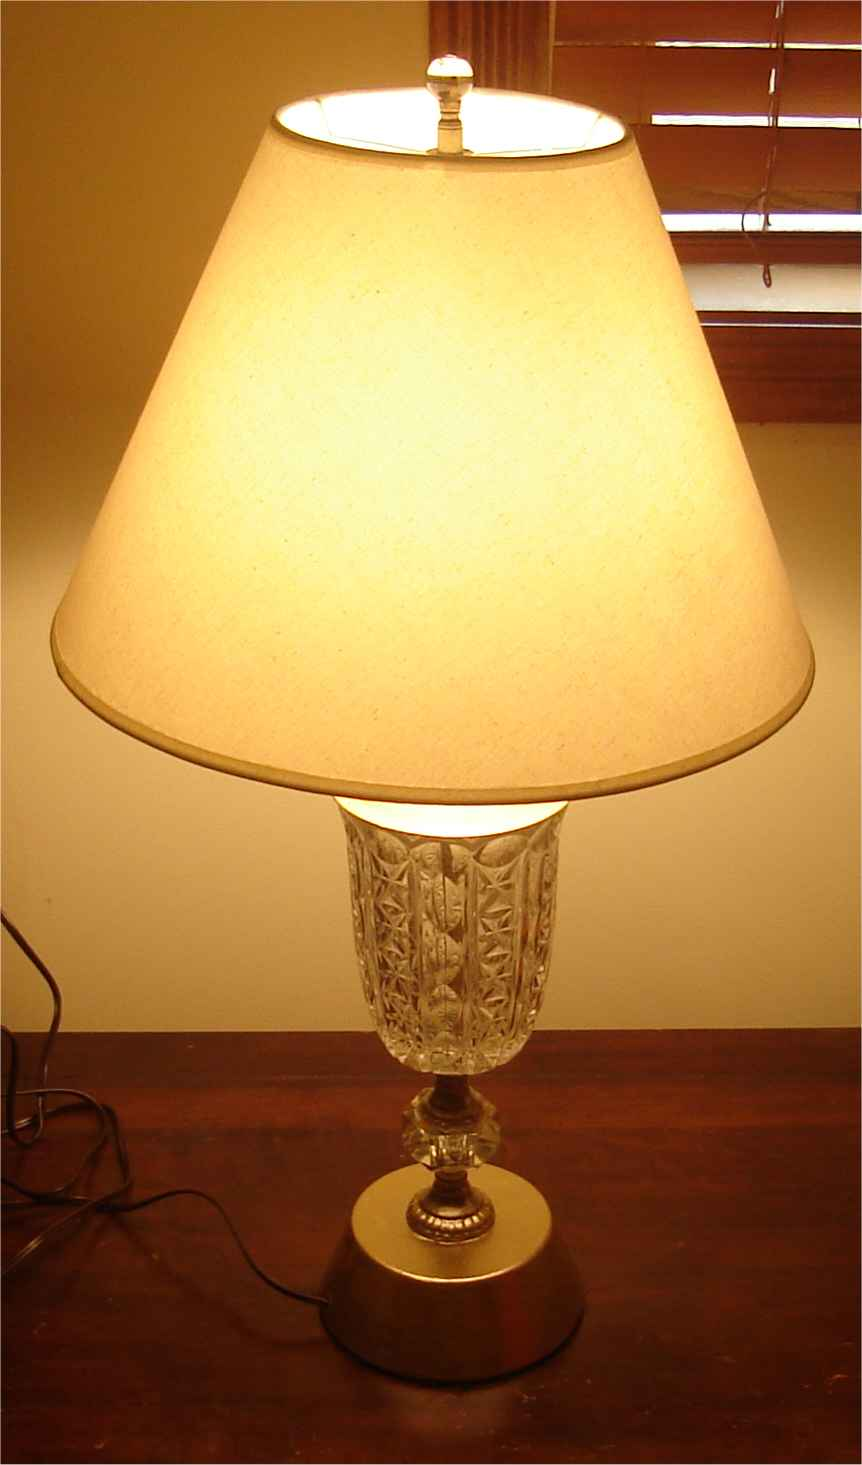 Nana's lamp